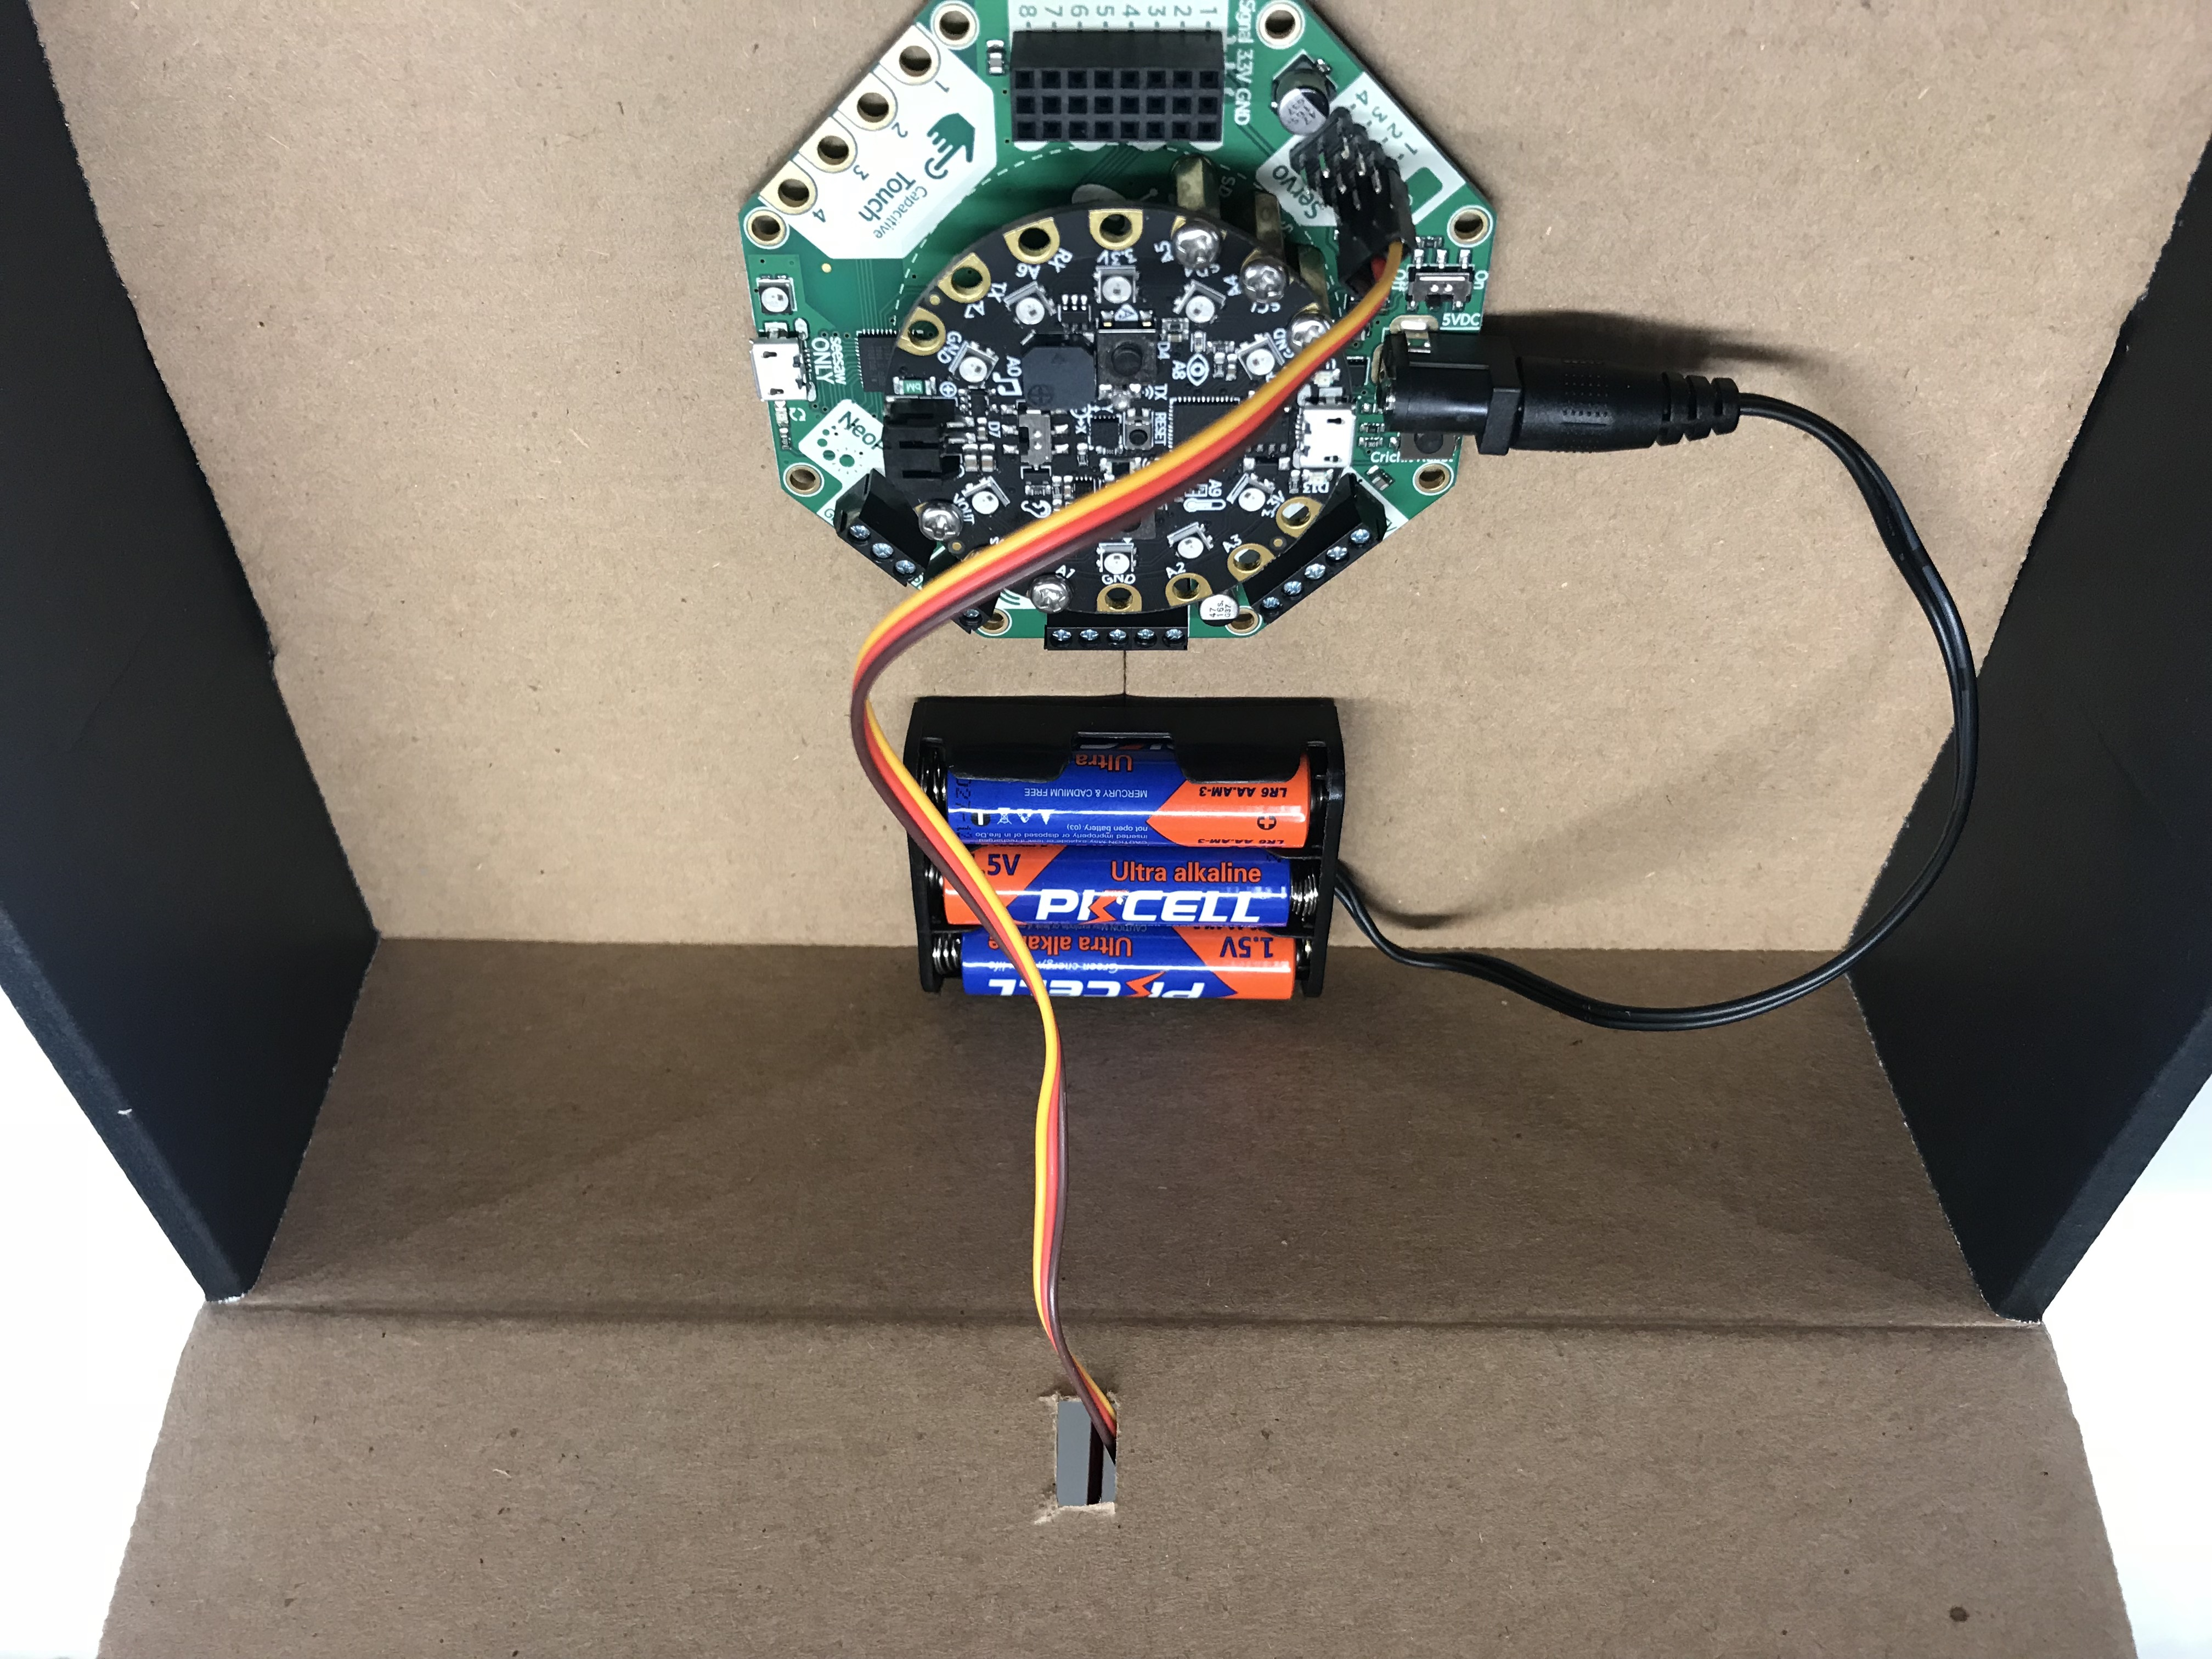 circuitpython_IMG_4189.jpg